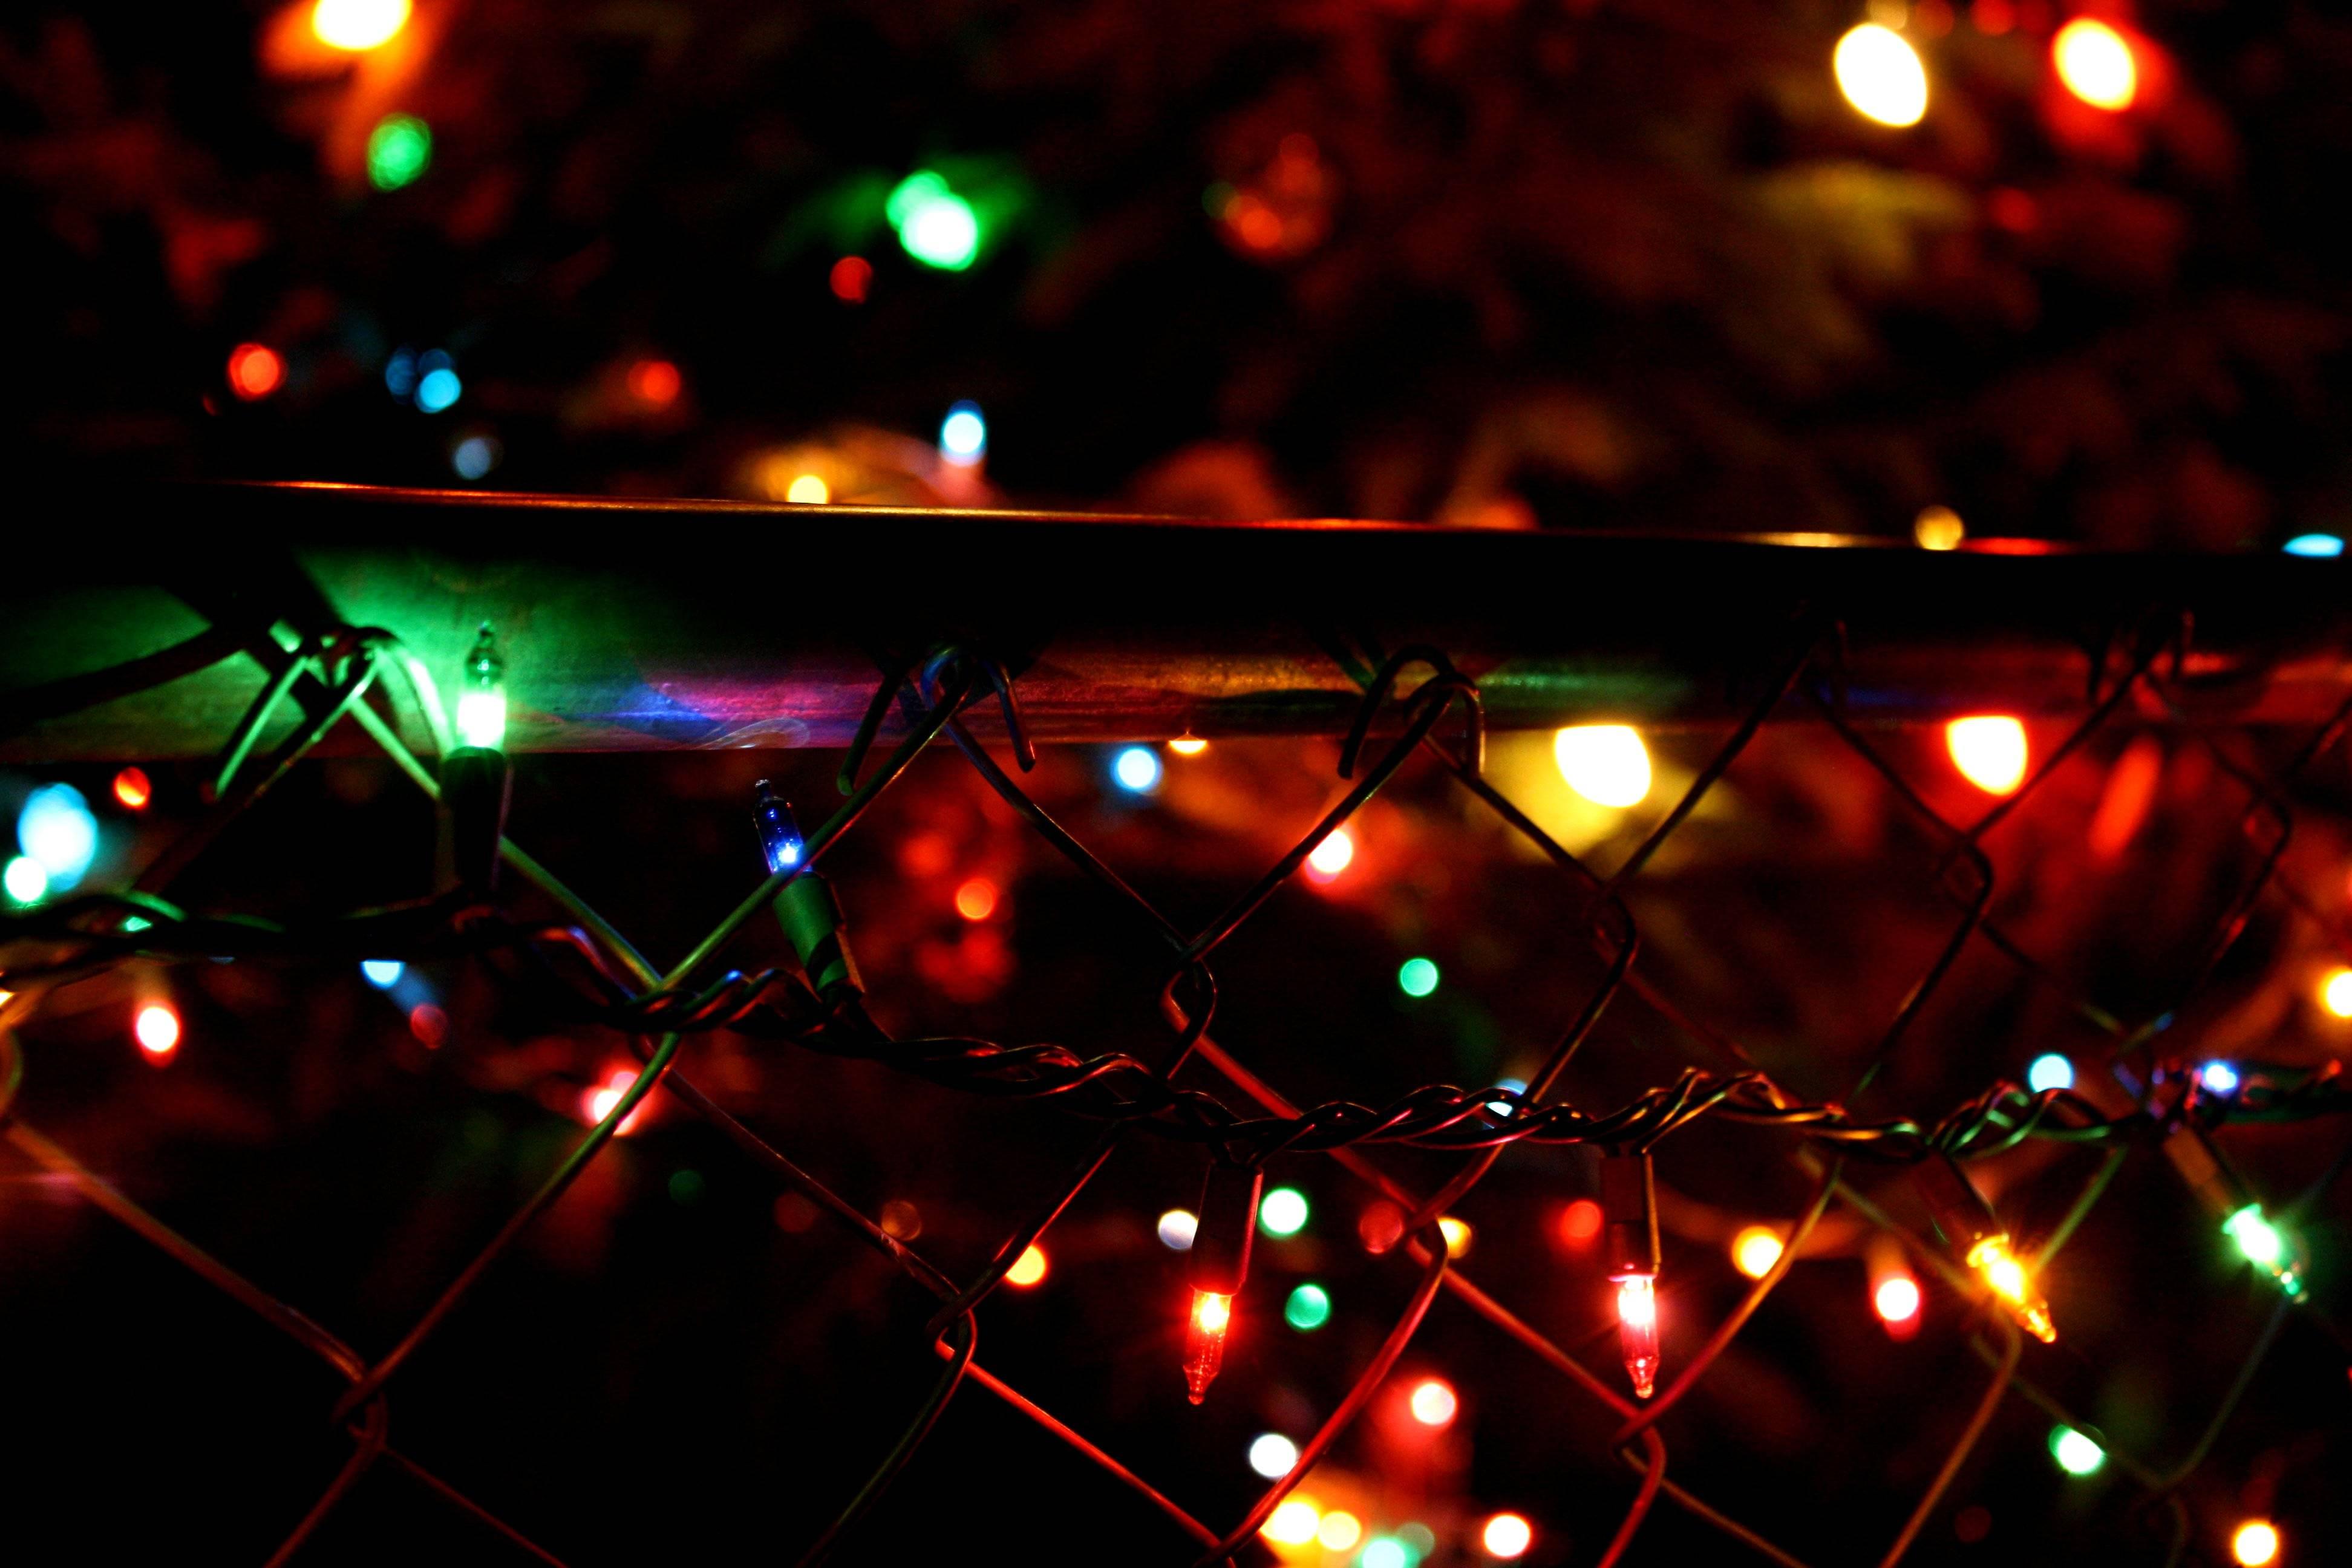 Christmas Lights Decorations Desktop Wallpaper